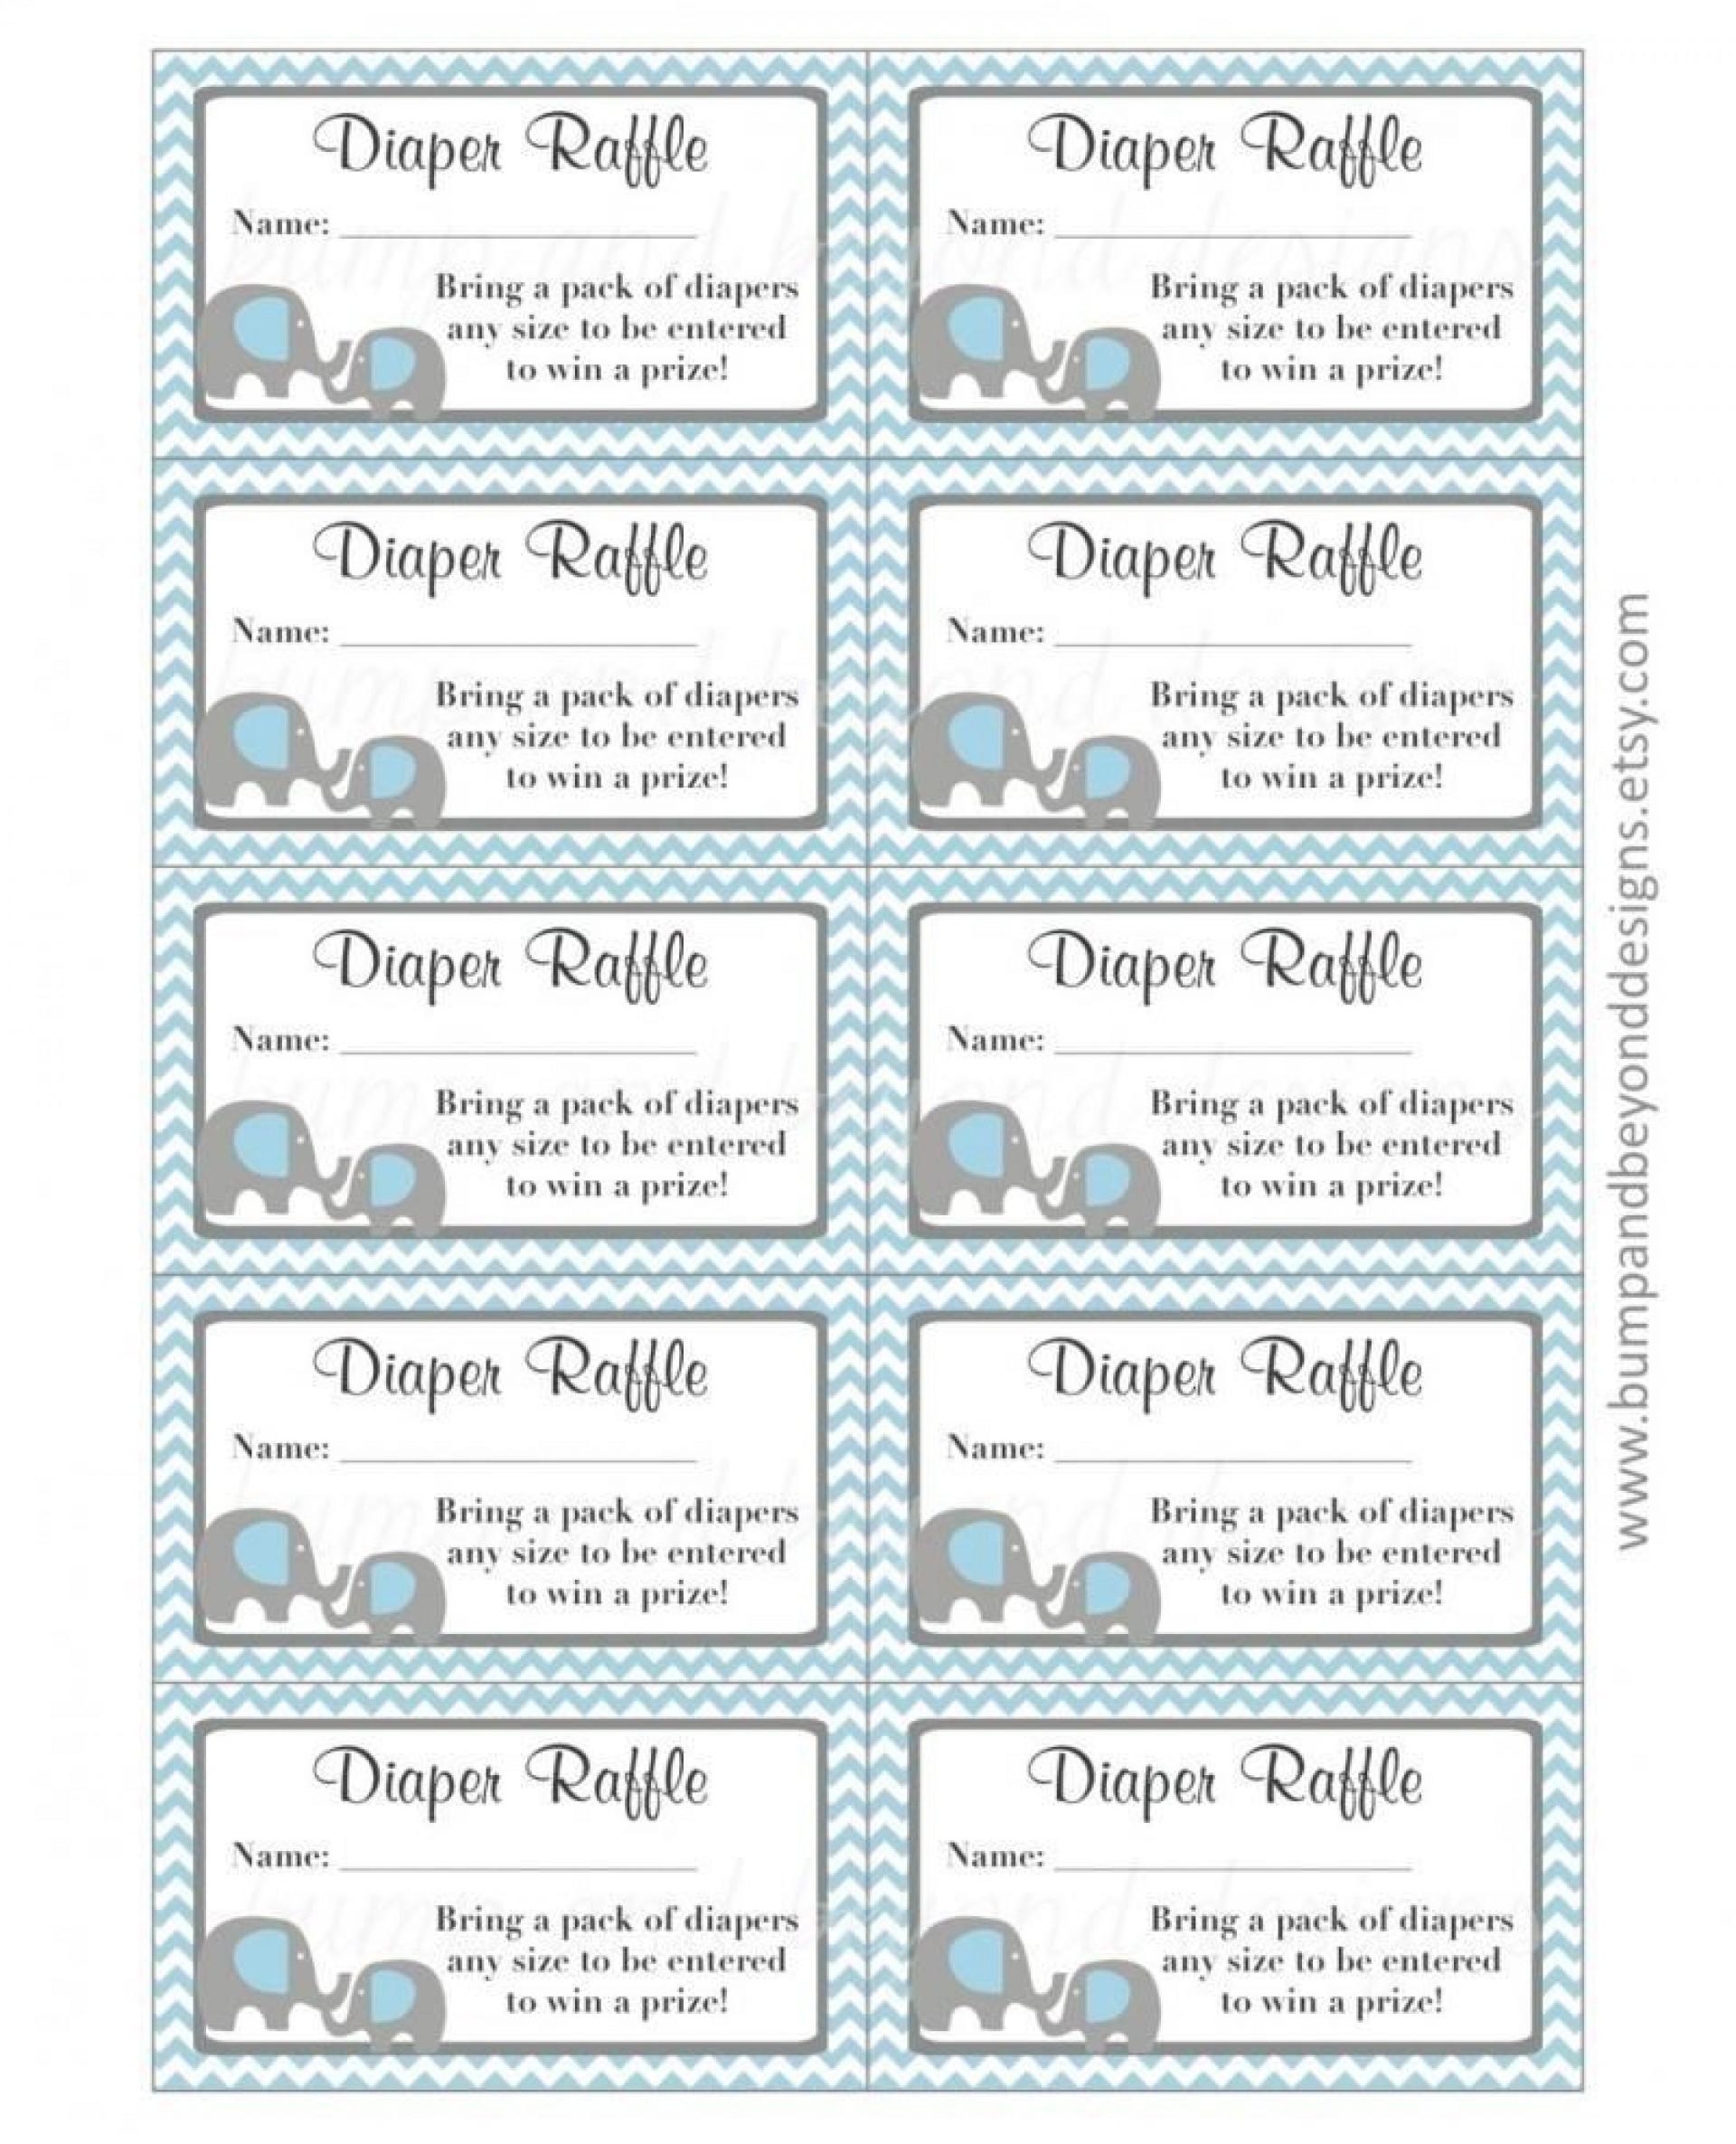 003 Unbelievable Diaper Raffle Ticket Template High Def  Free Printable Download1920